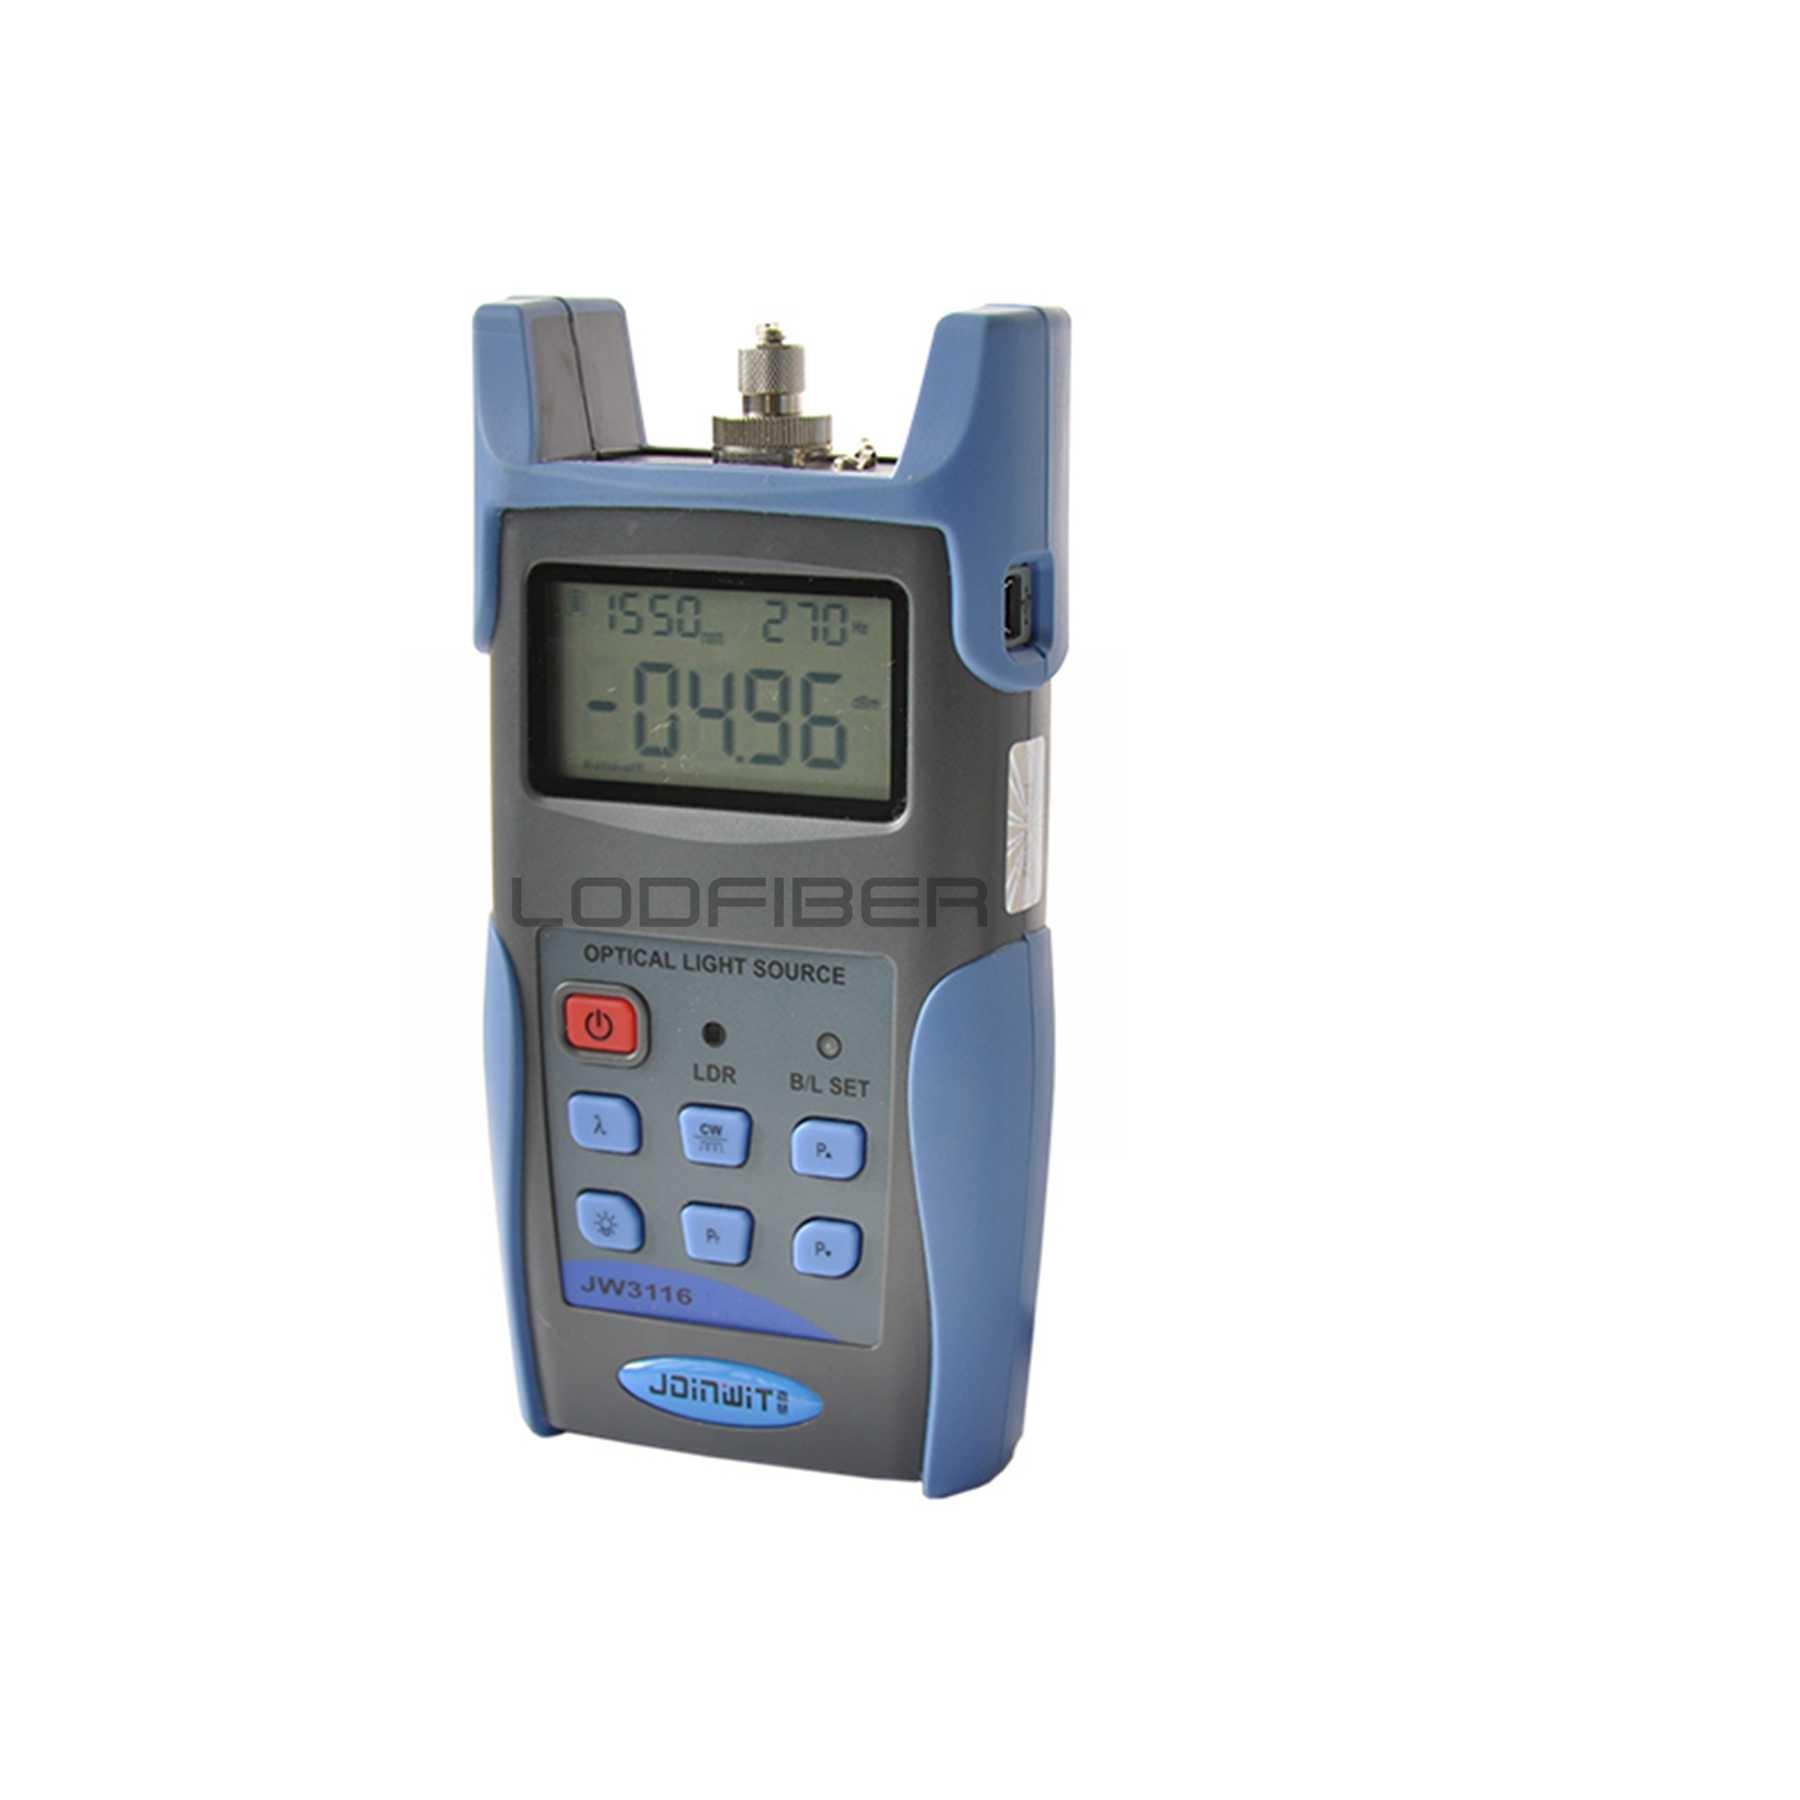 LODFIBER JW3116 Handheld Fonte de Luz 850/1310nm